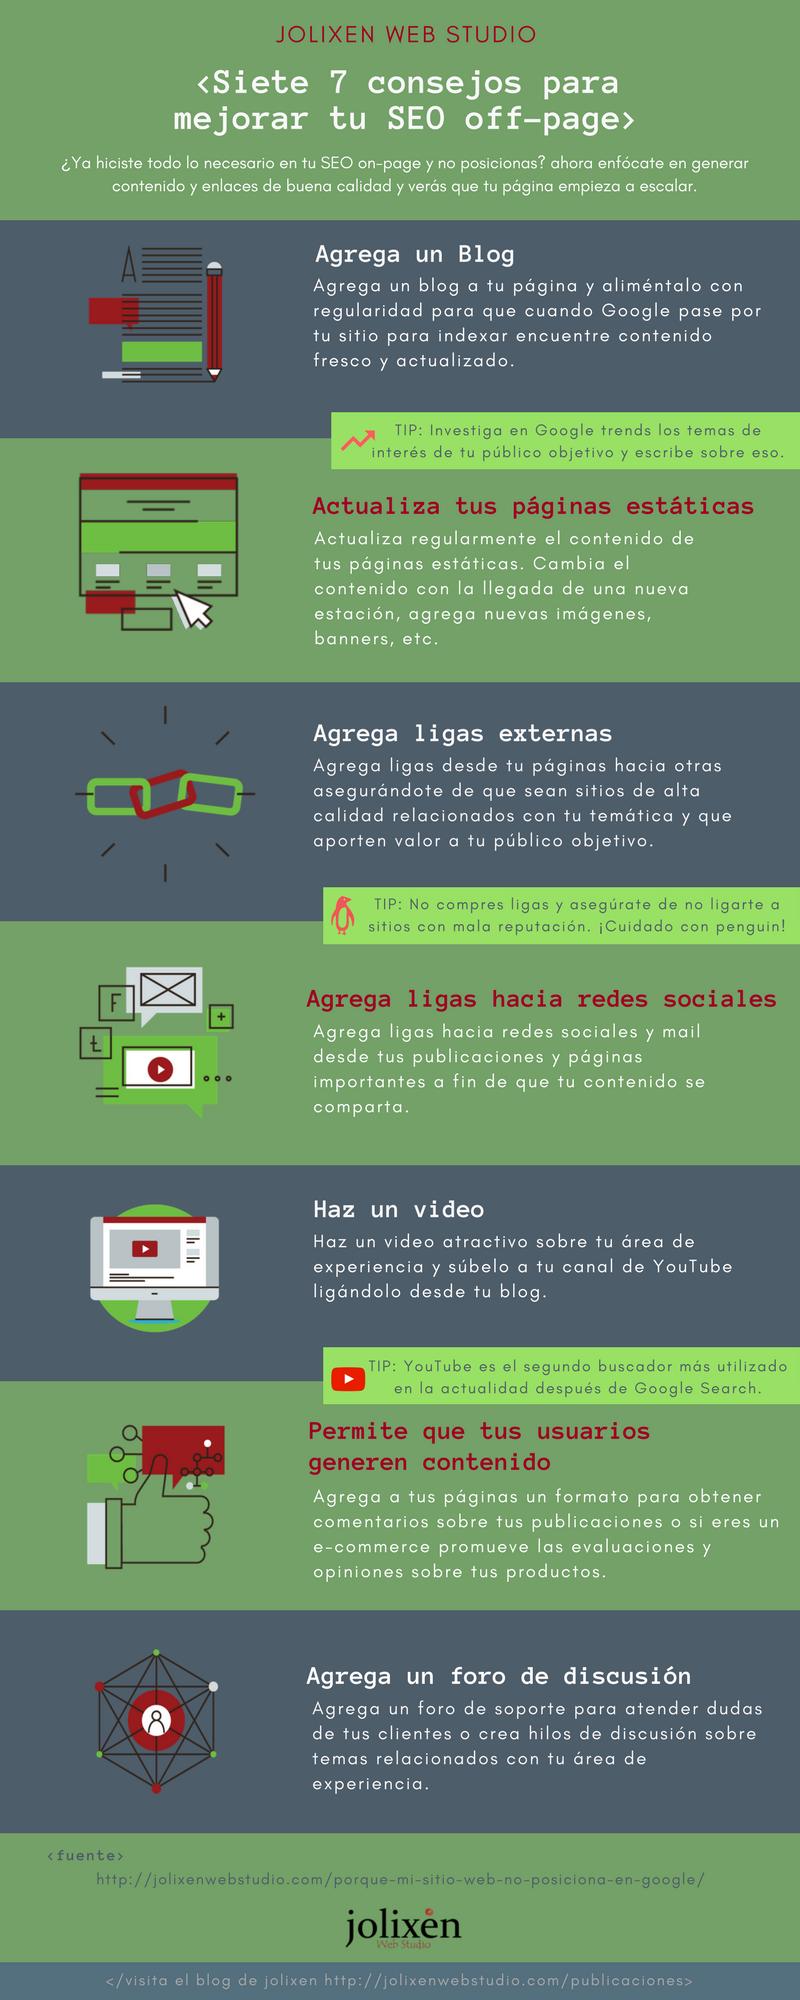 Infográfico de Posicionamiento SEO off-site